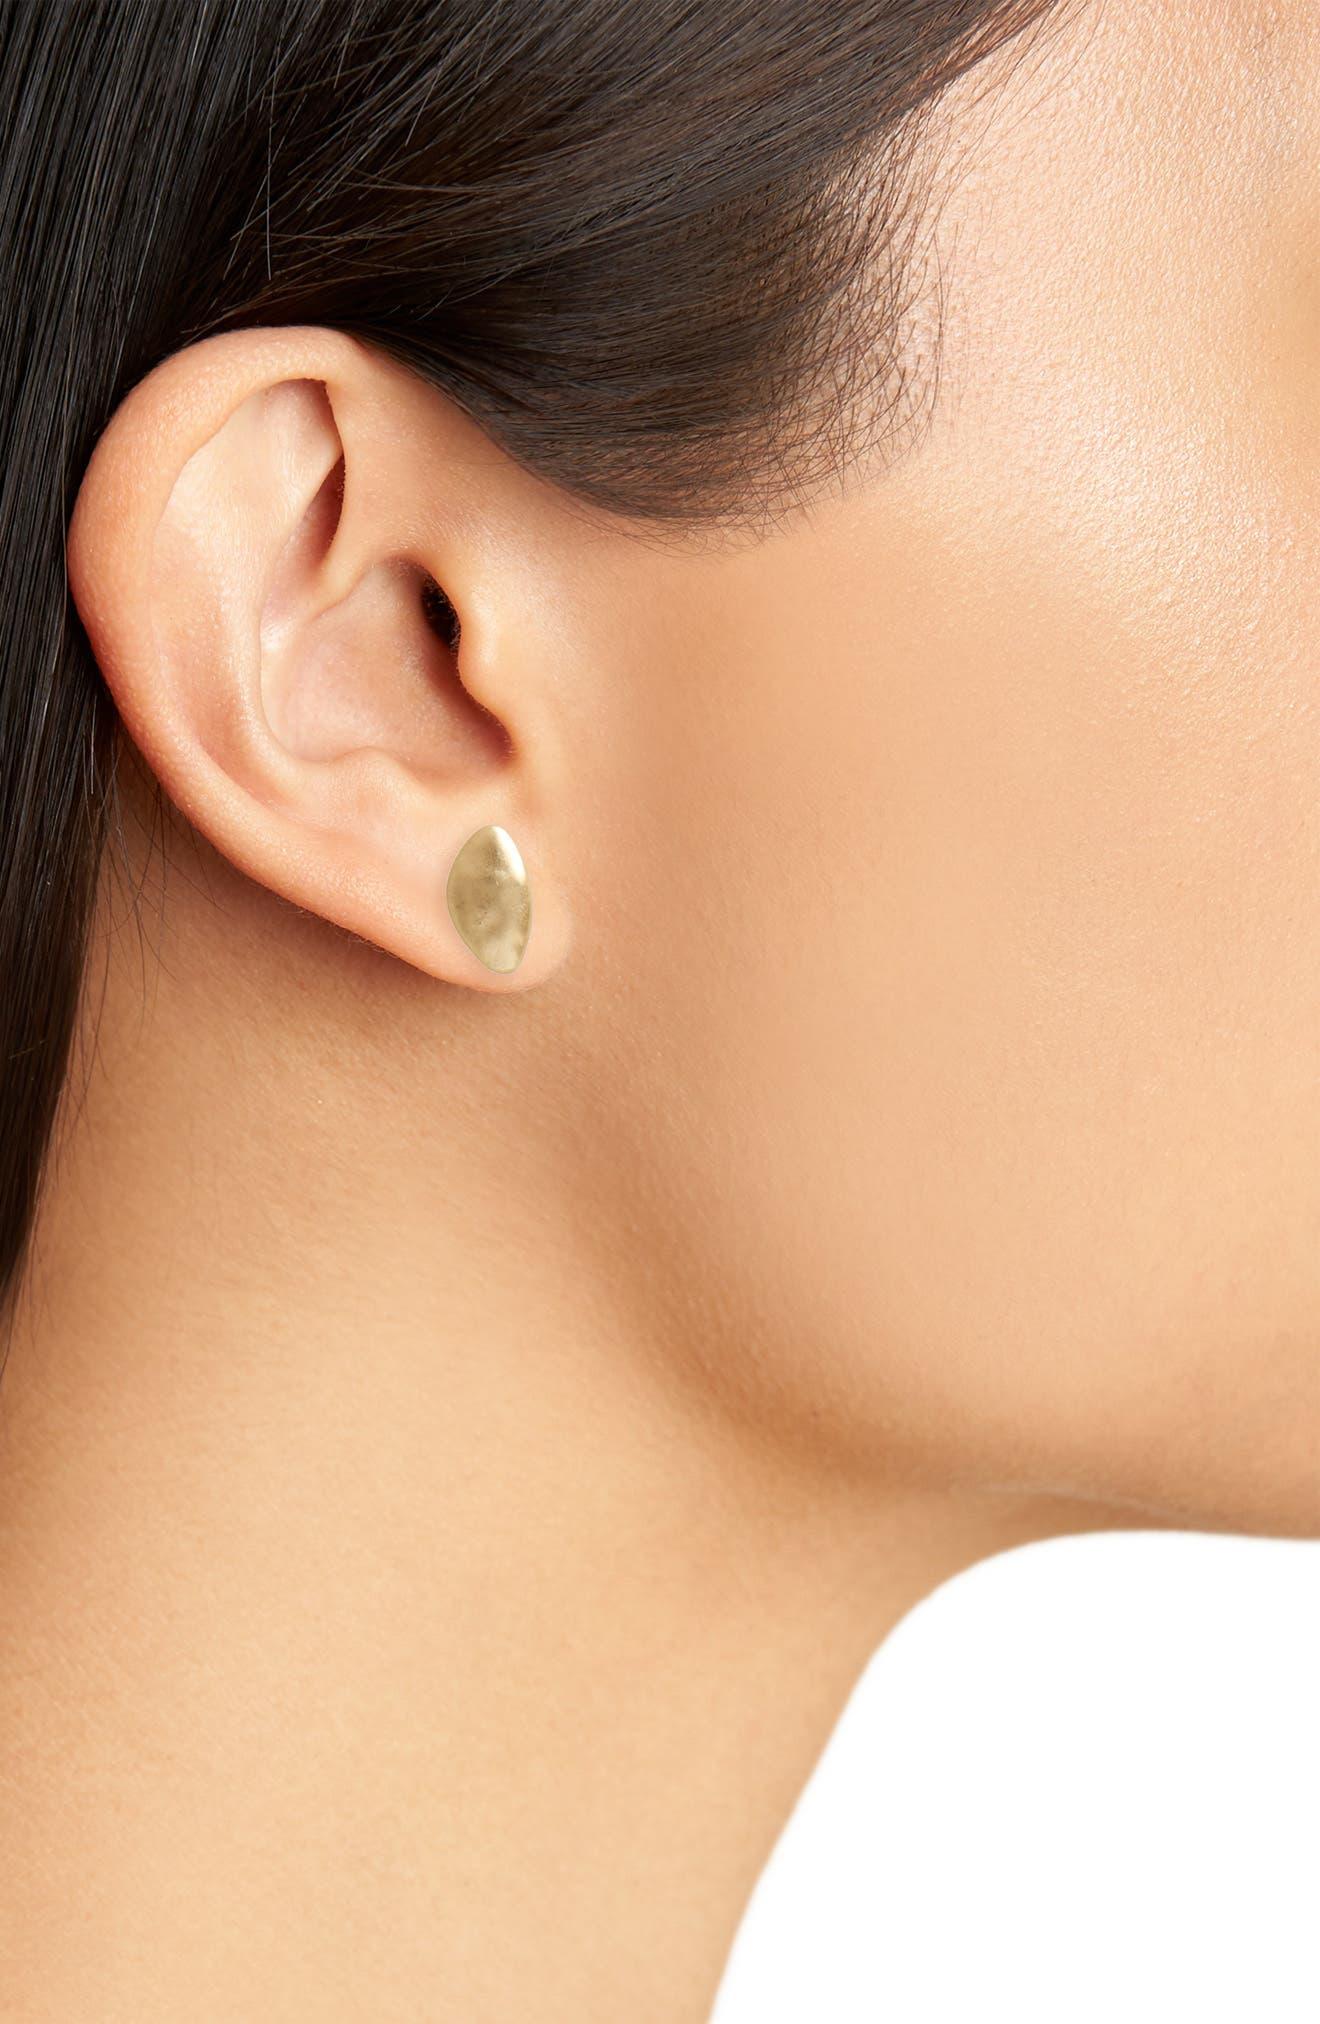 Brushed Metal Stud Earrings,                             Alternate thumbnail 2, color,                             Worn Gold